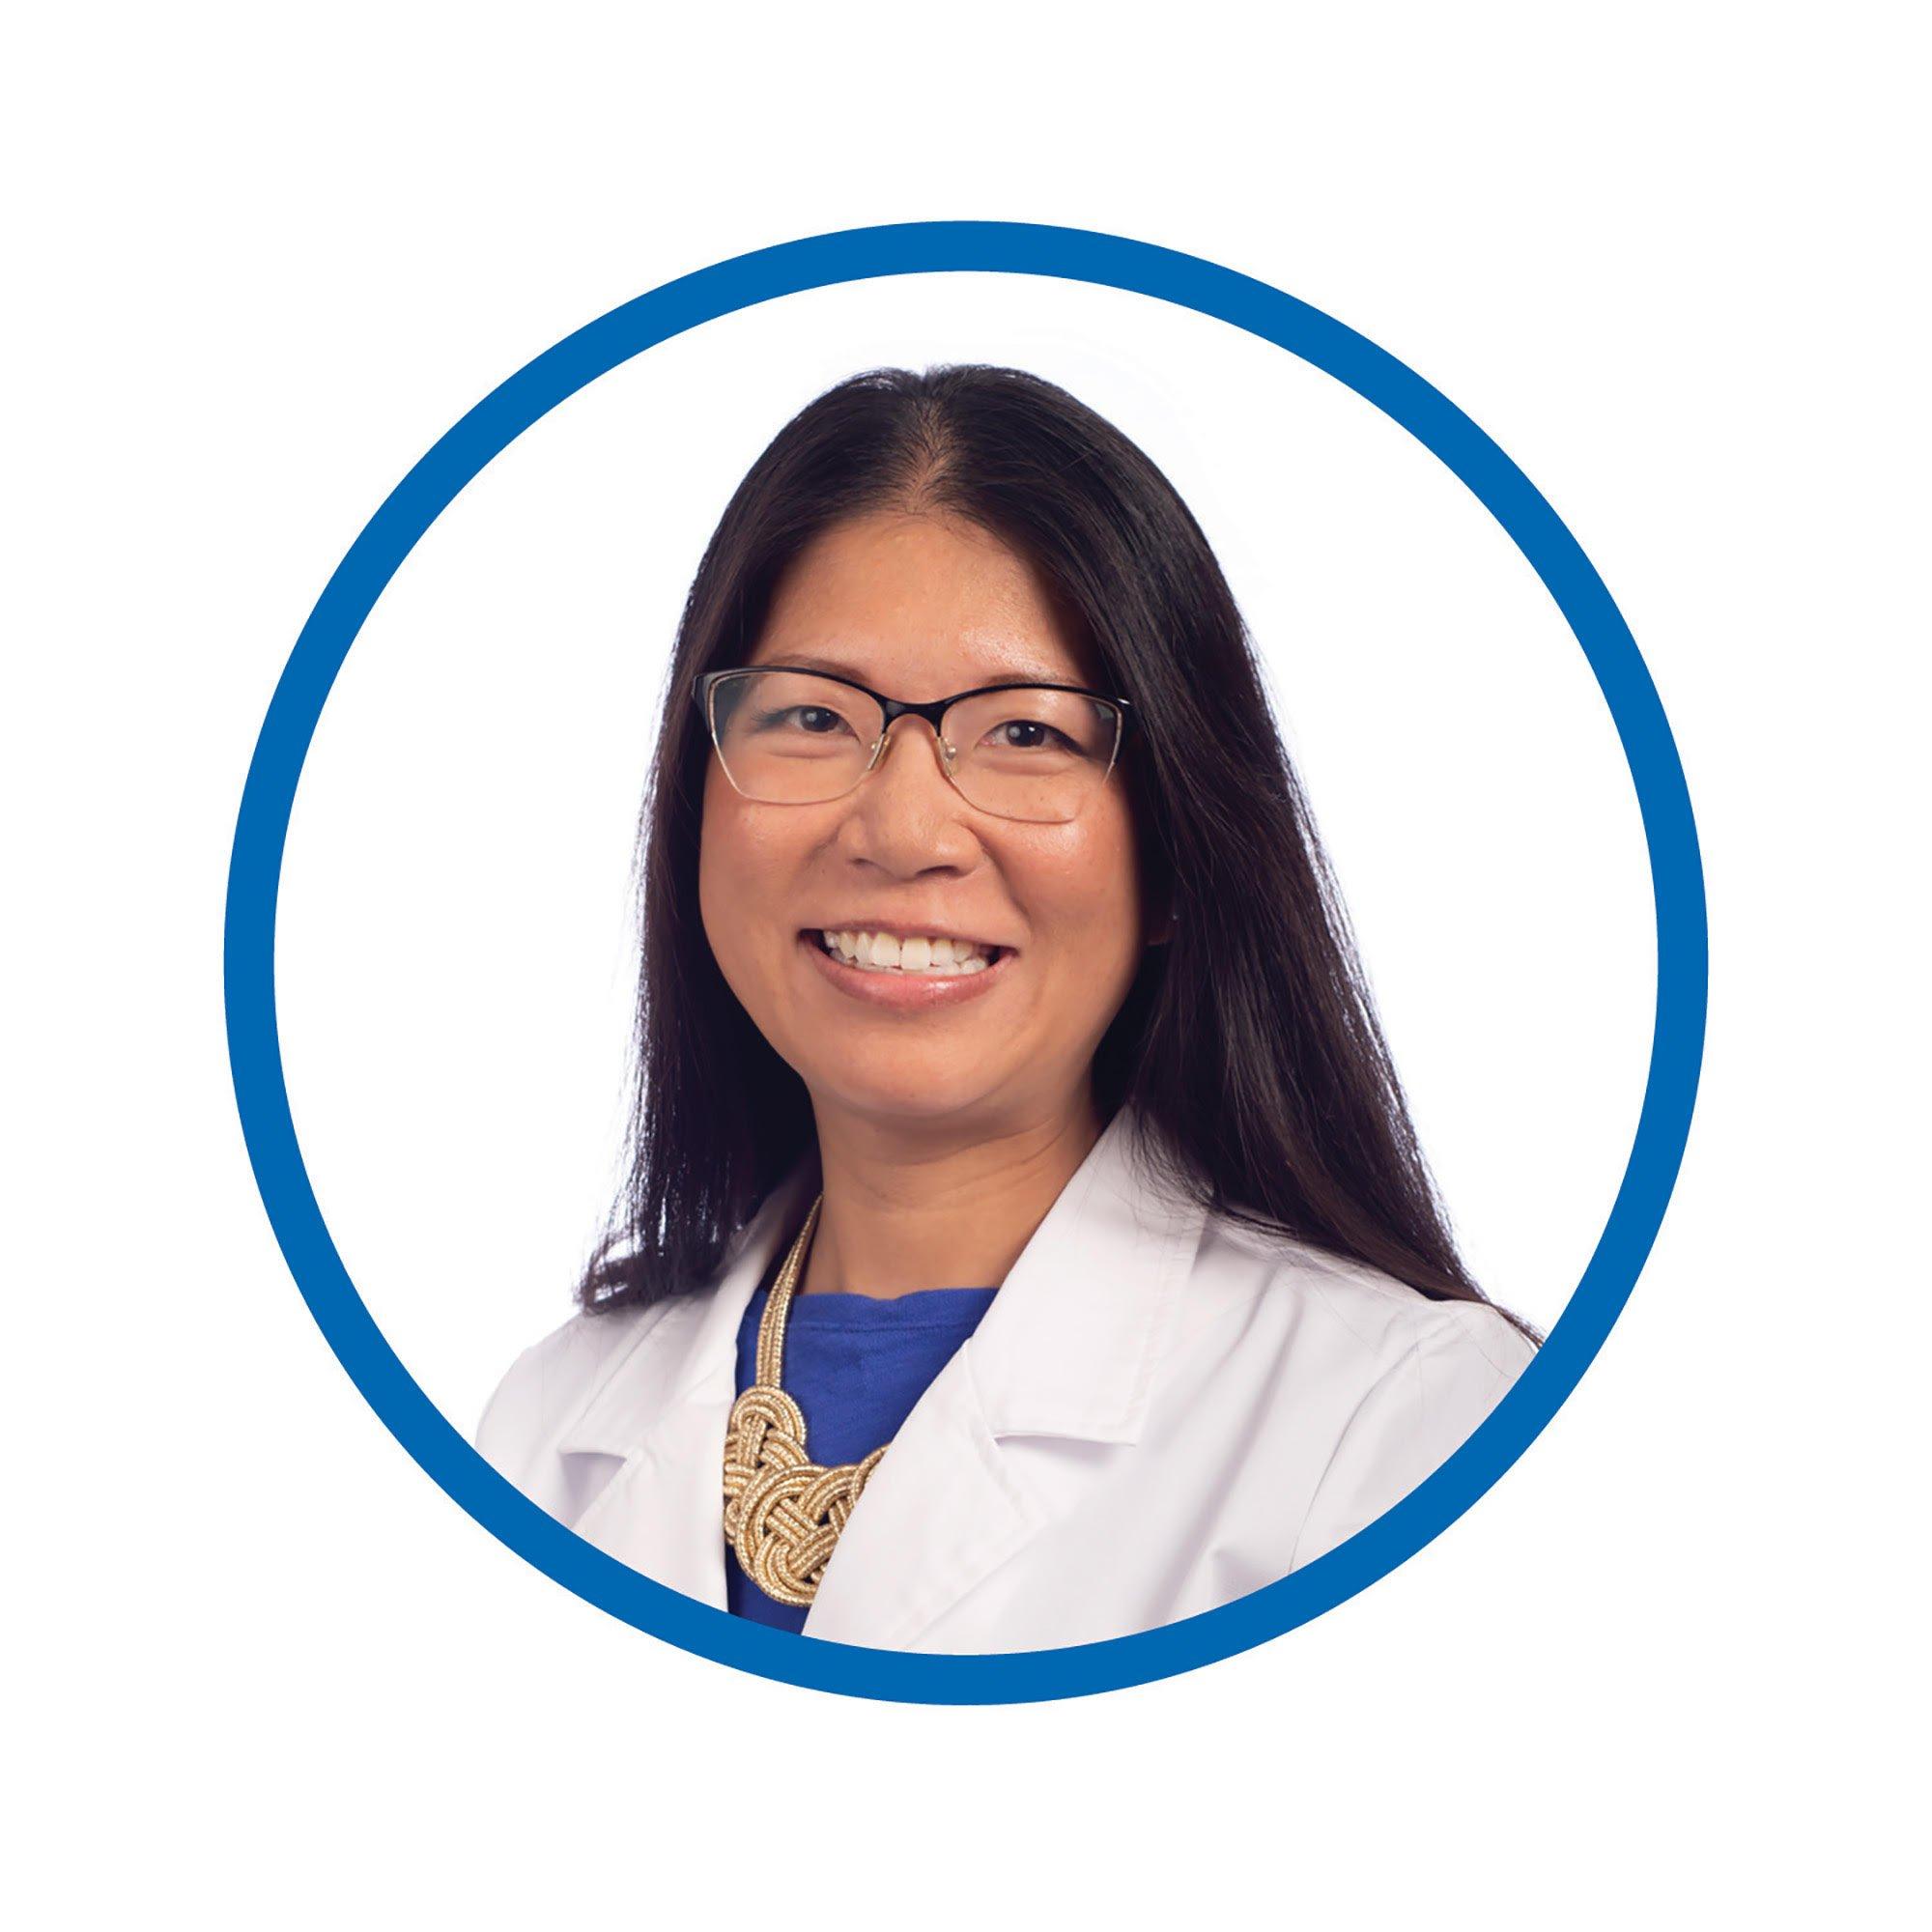 Christine Chiu-Geers, M.D.